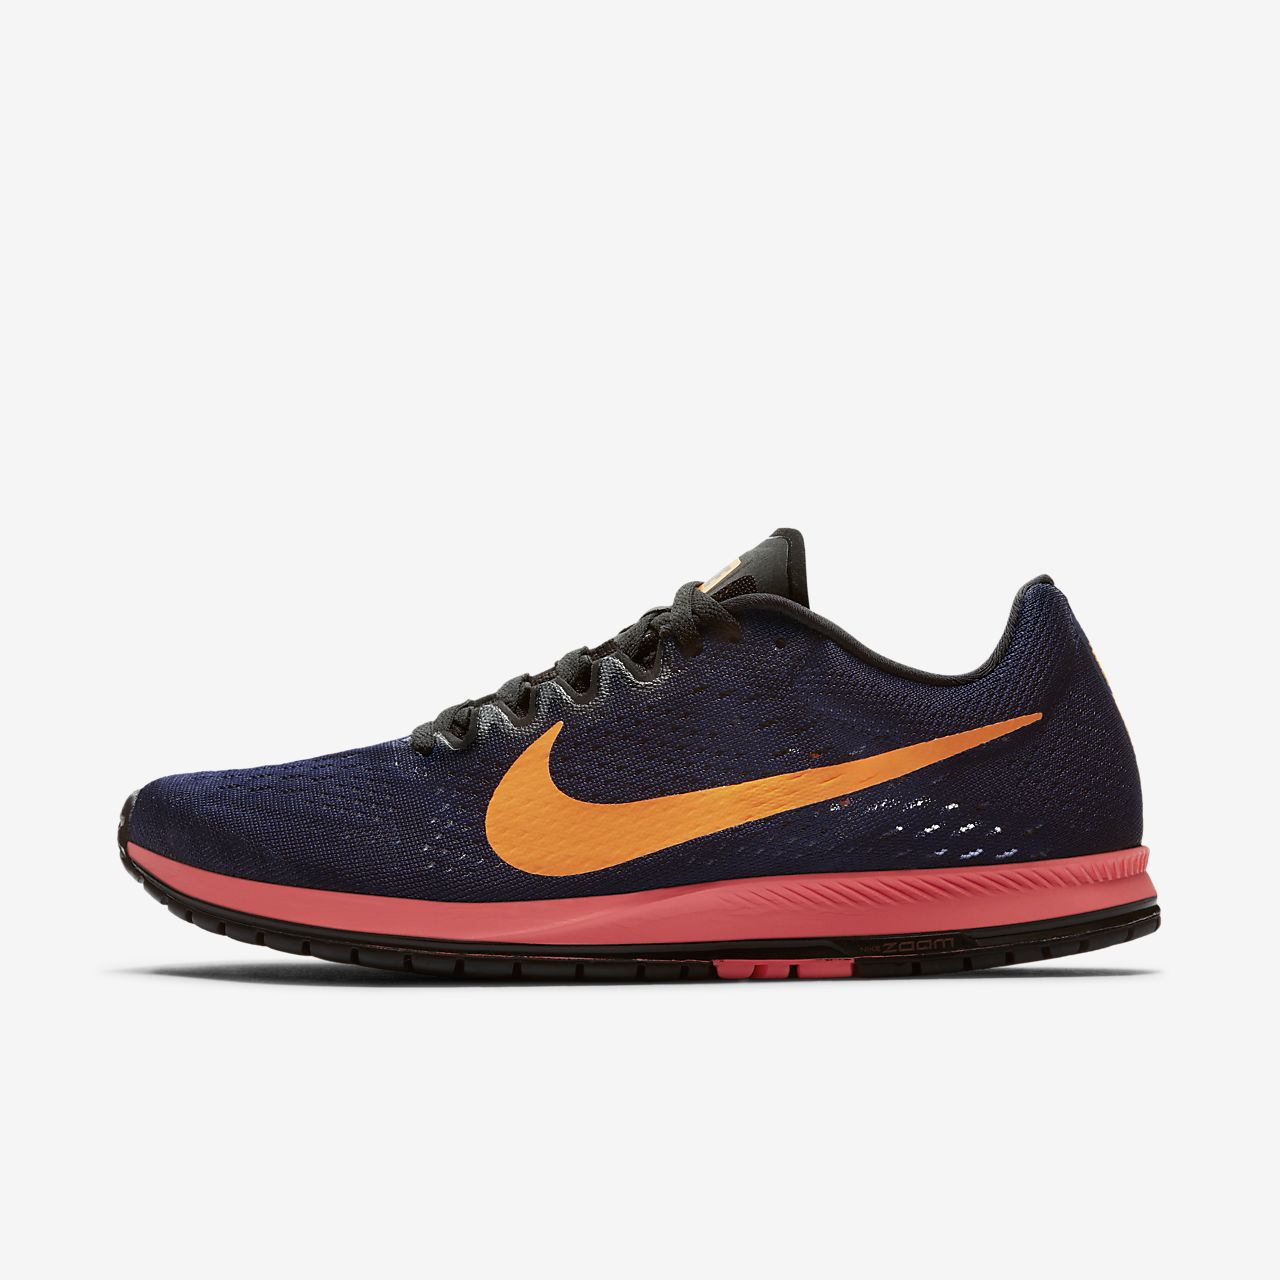 Zoom 6 Fr Nike De Course Mixte Streak Chaussure HxIC6Tqw1